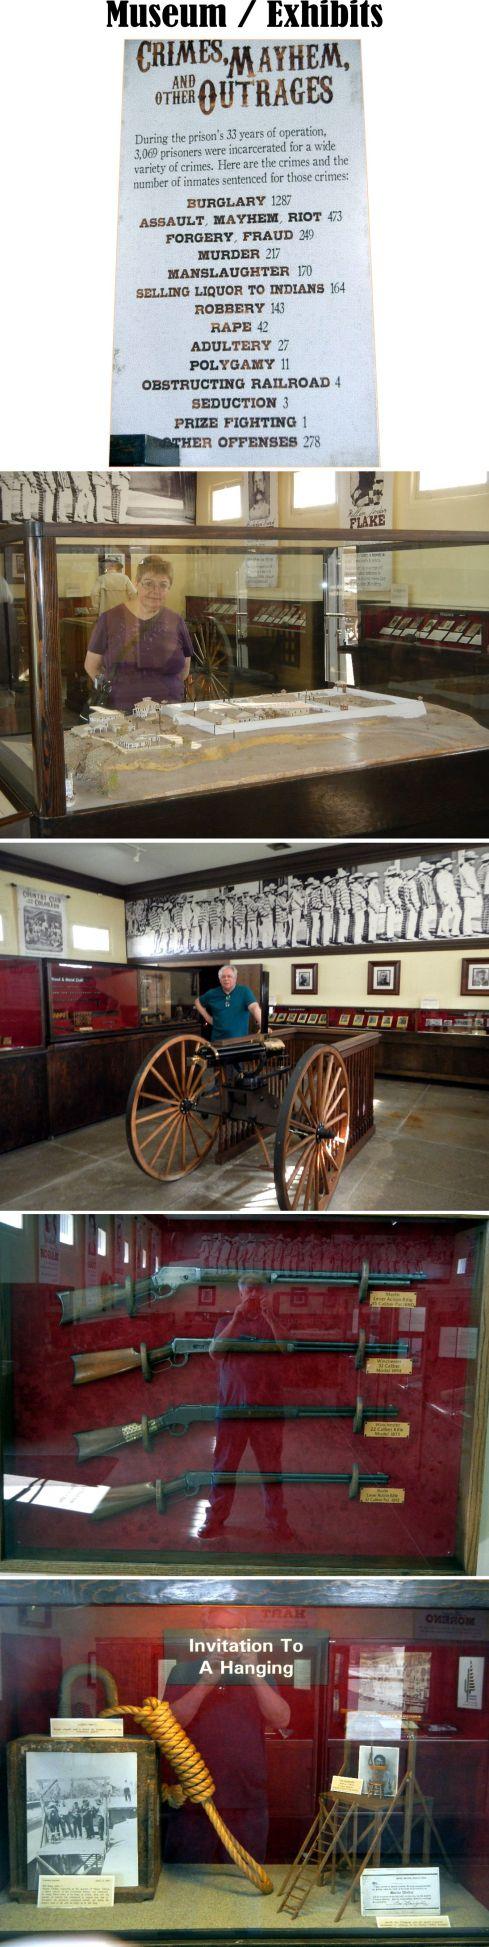 Yuma Territorial Prison State Historical Park 7